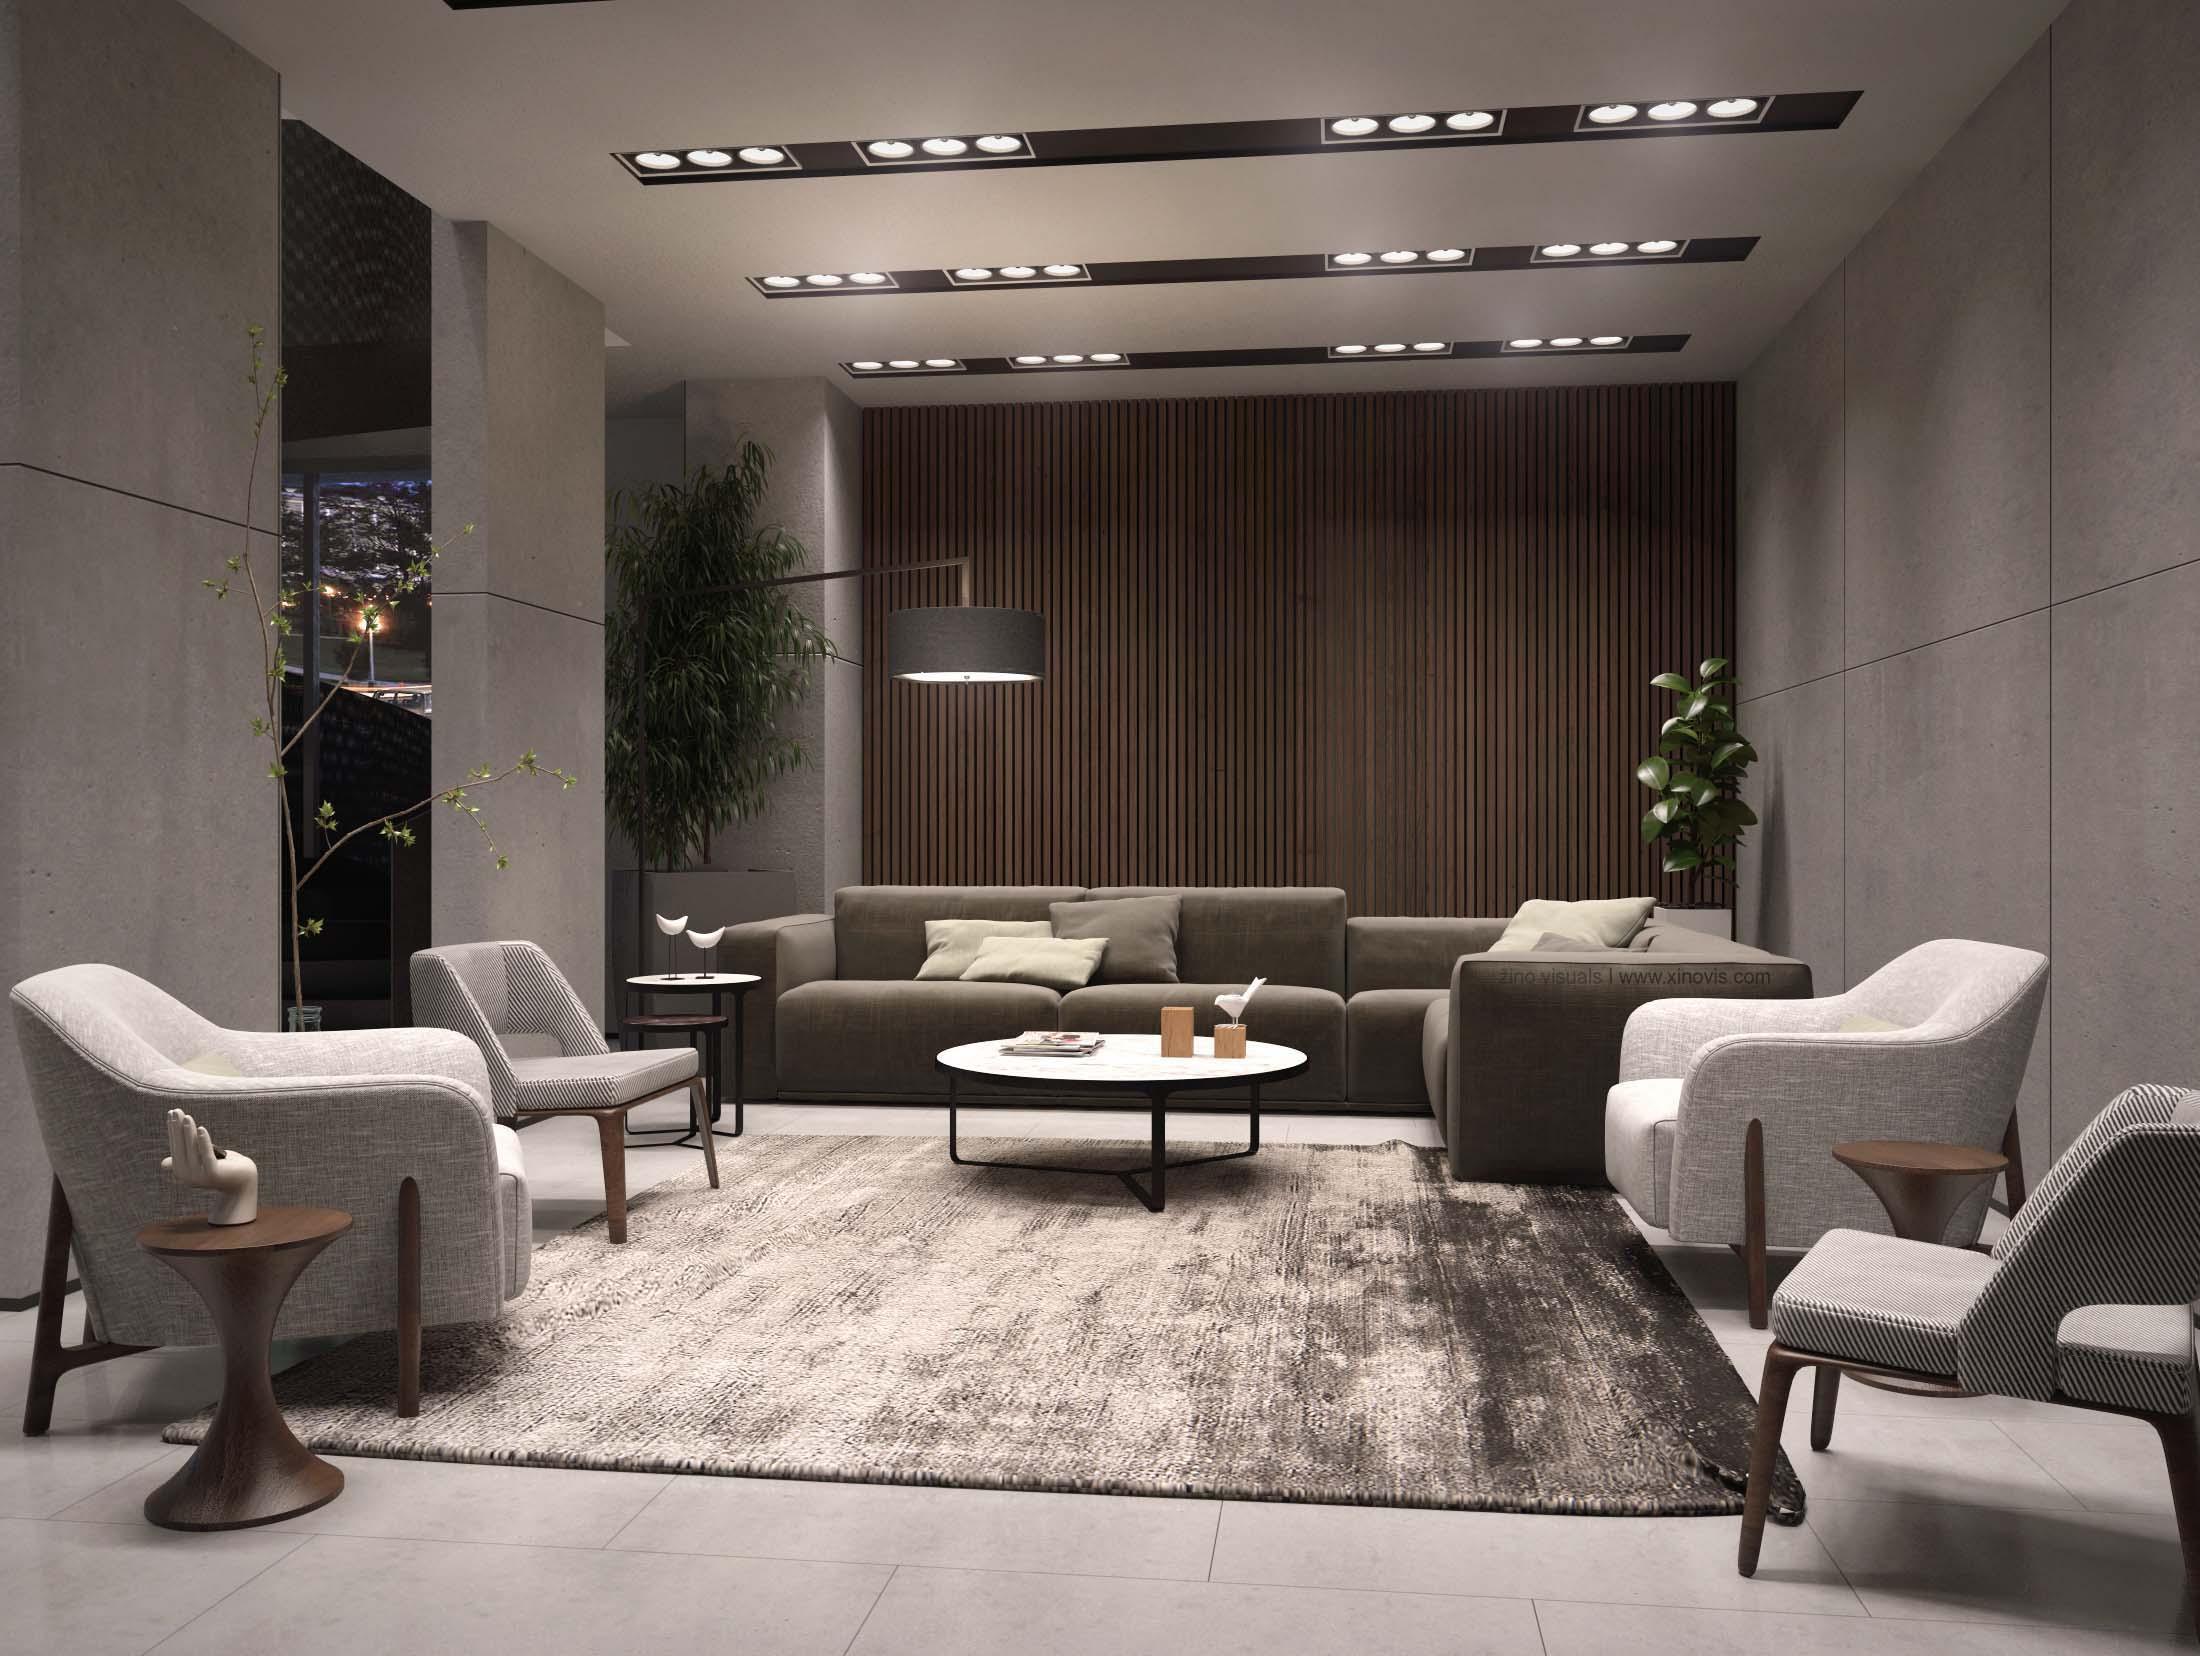 inovis architectural and interior design studios